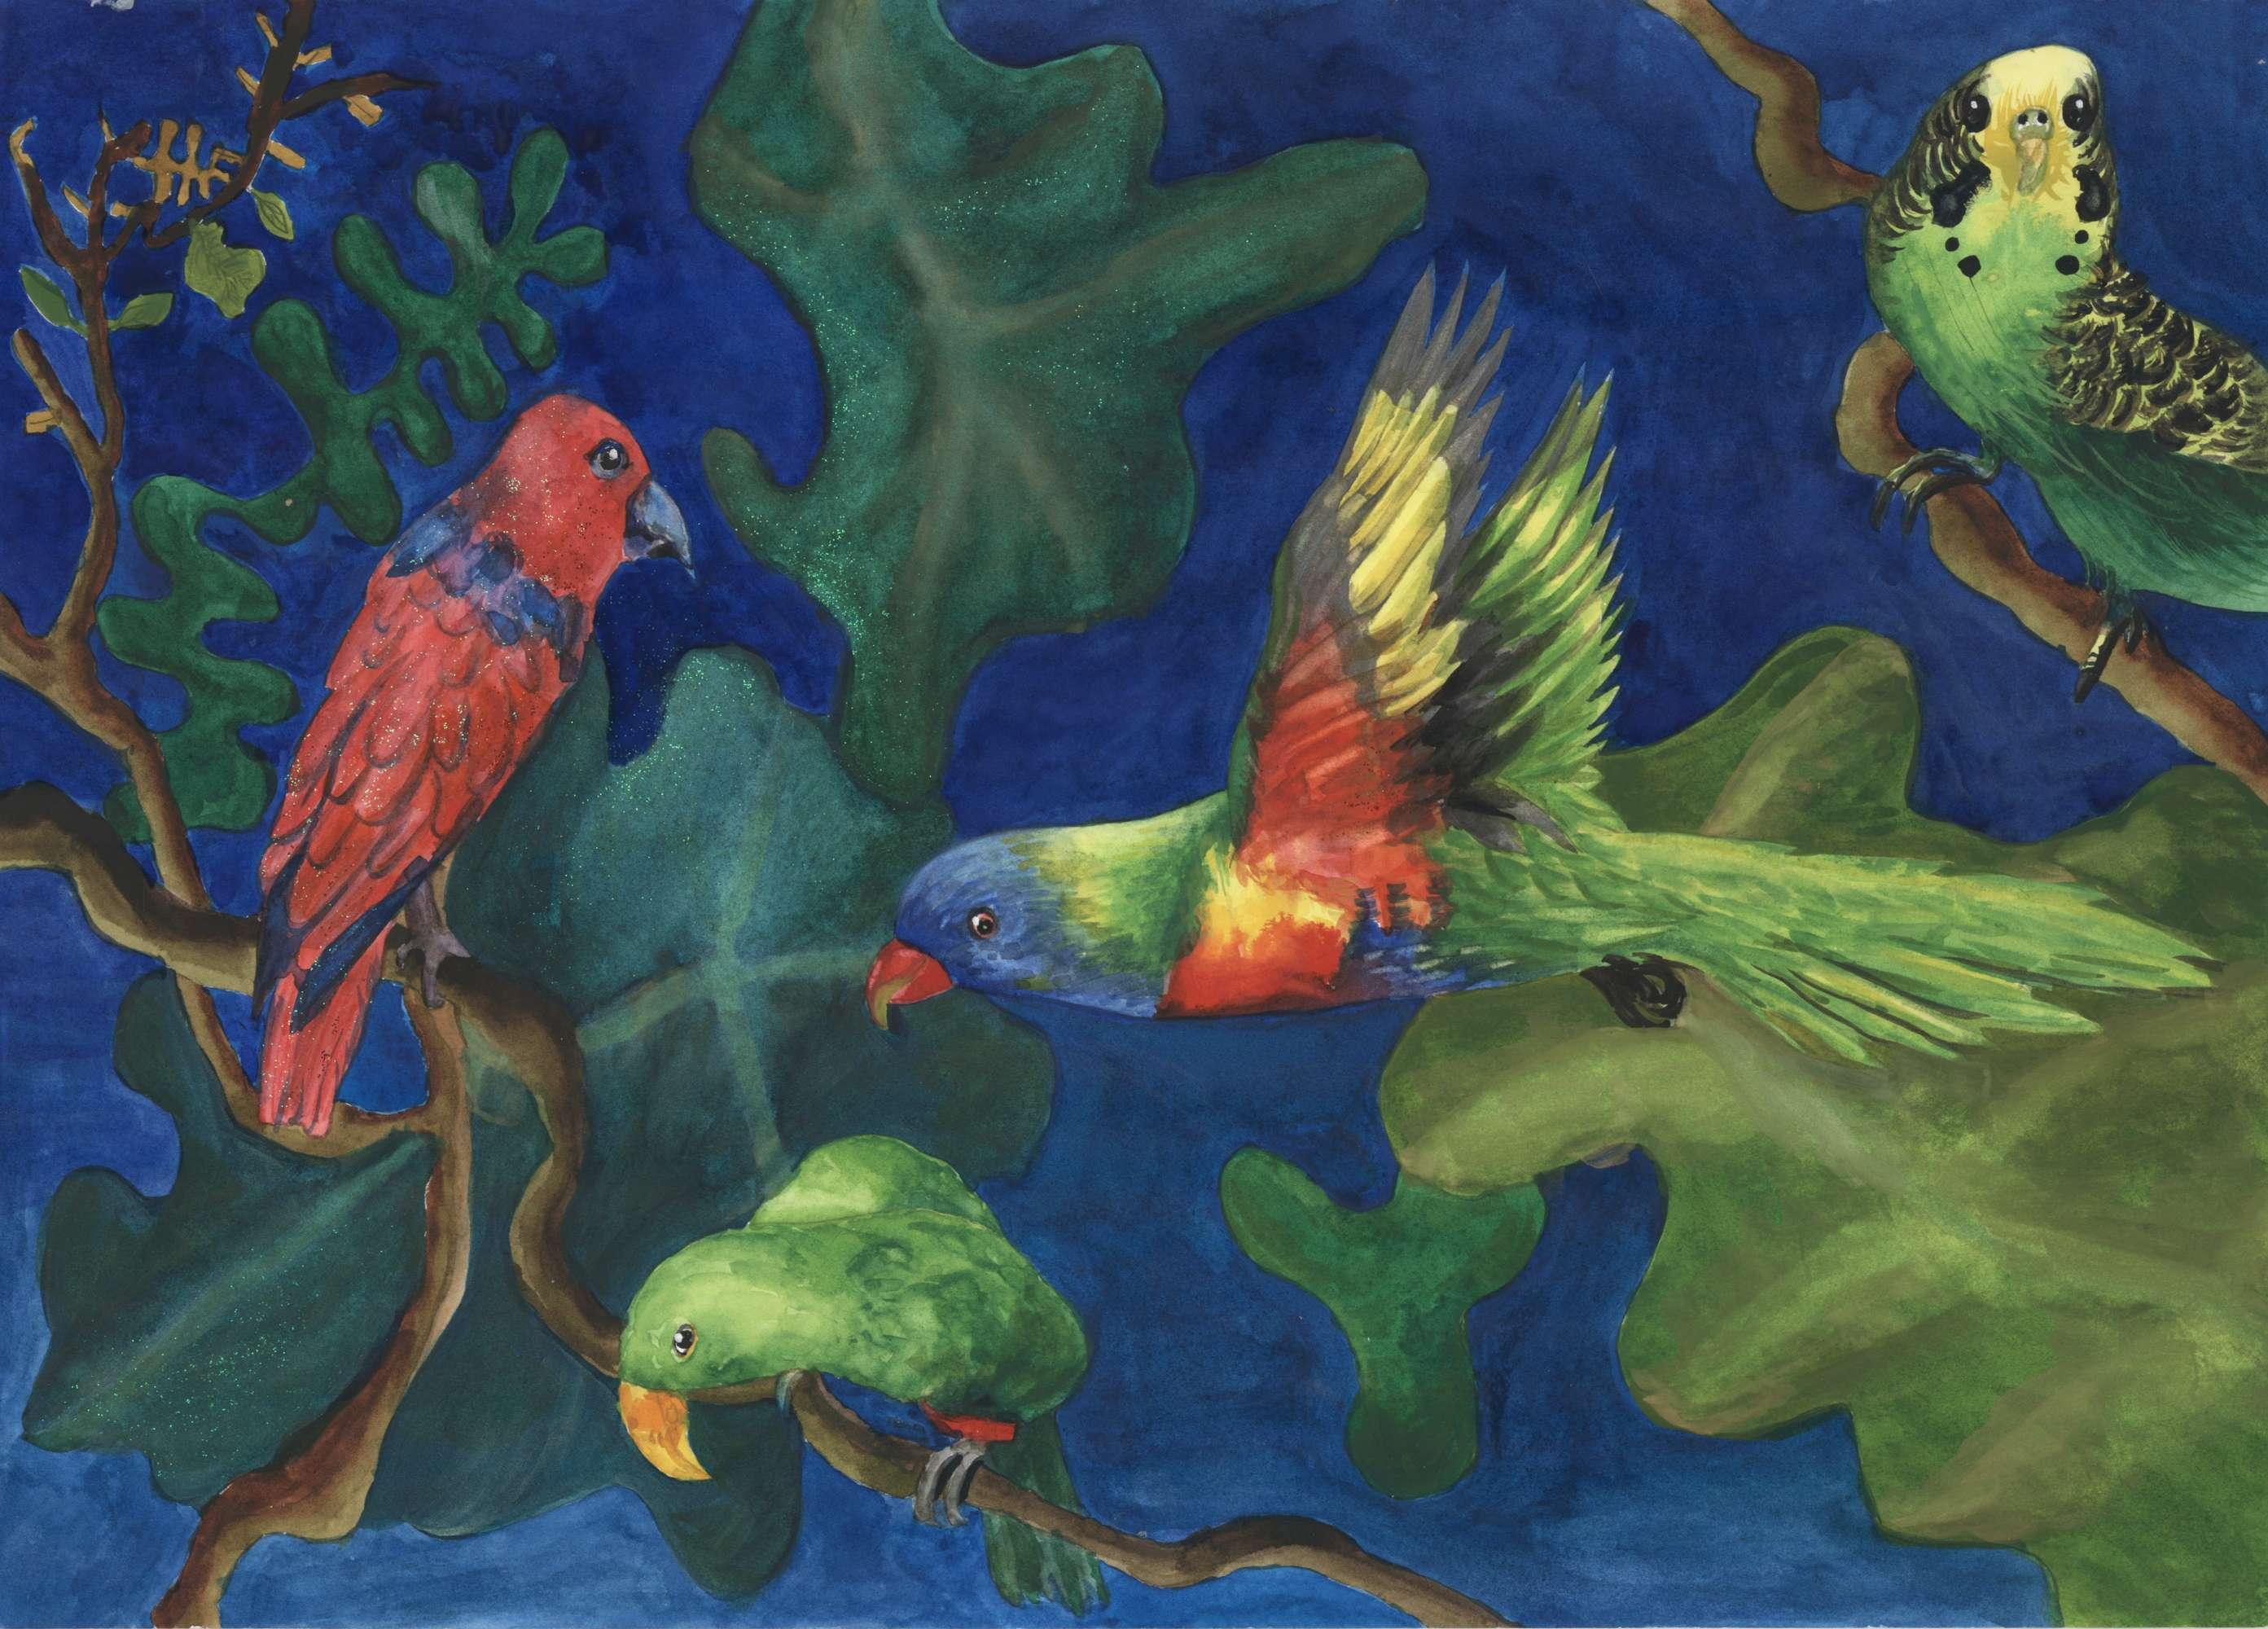 The Colourful Parrots